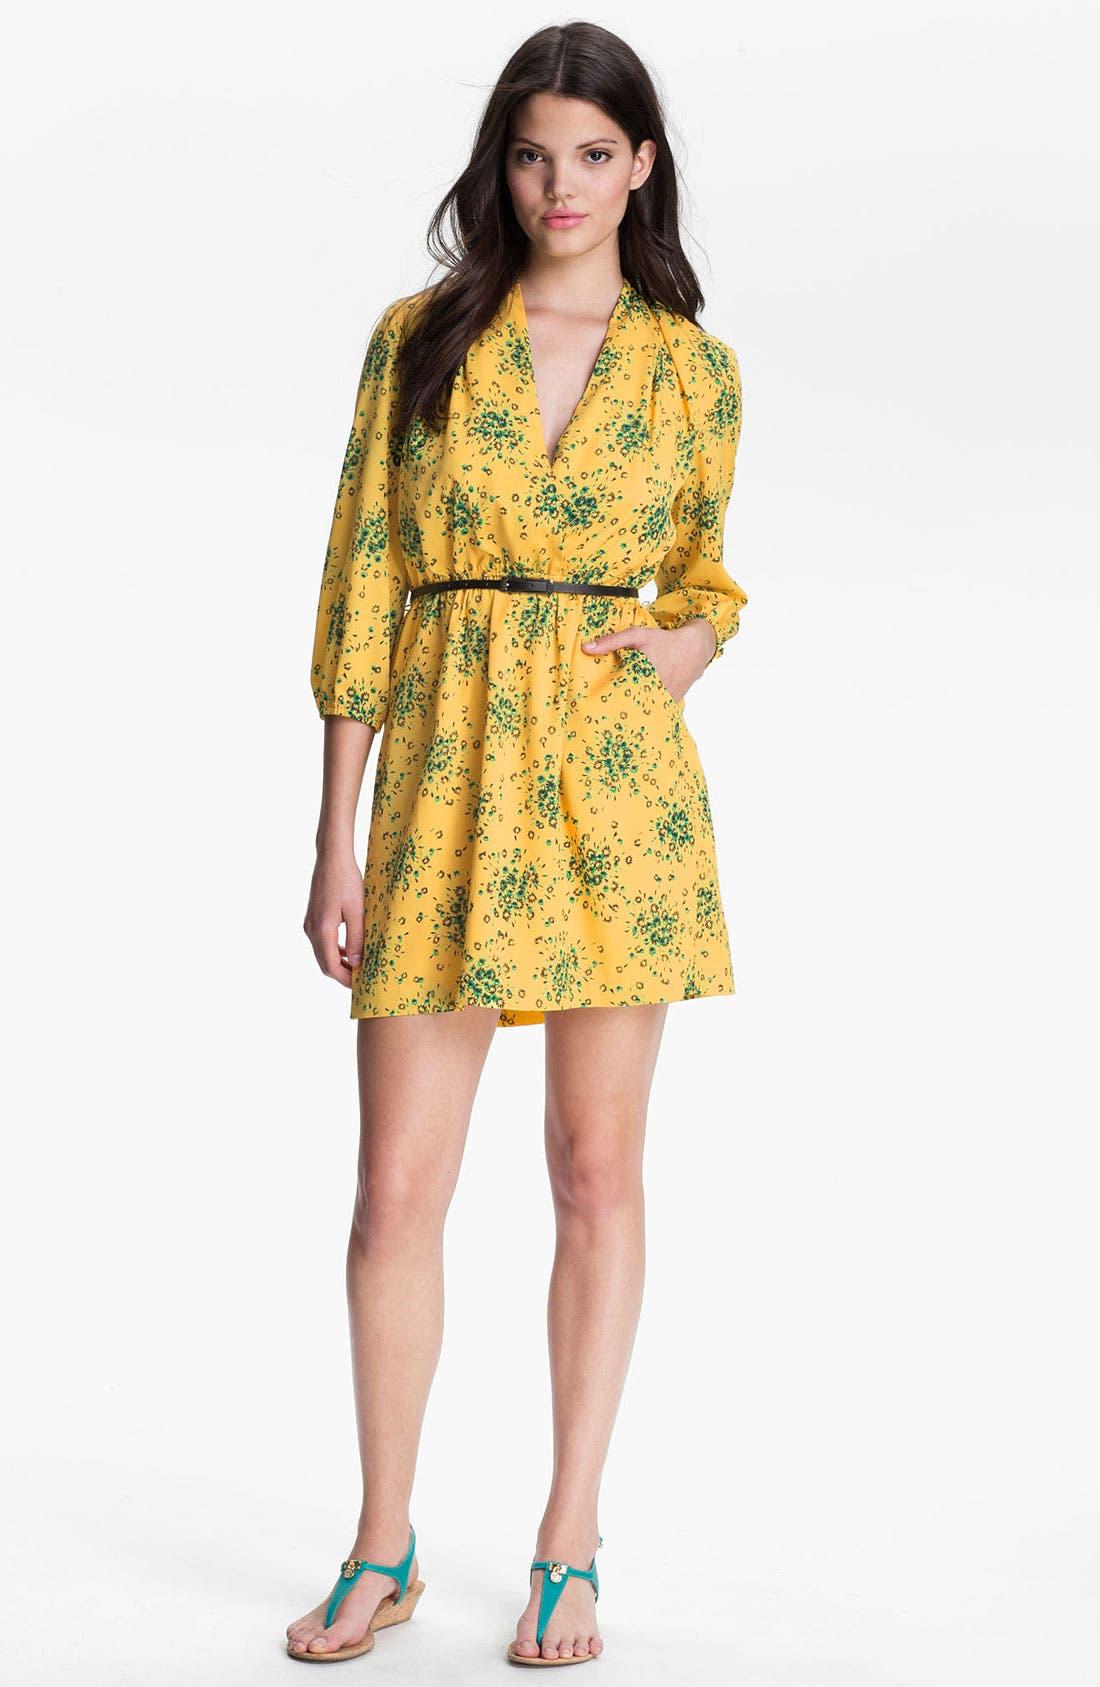 Alternate Image 1 Selected - Kensie 'Daisy Cluster' Dress